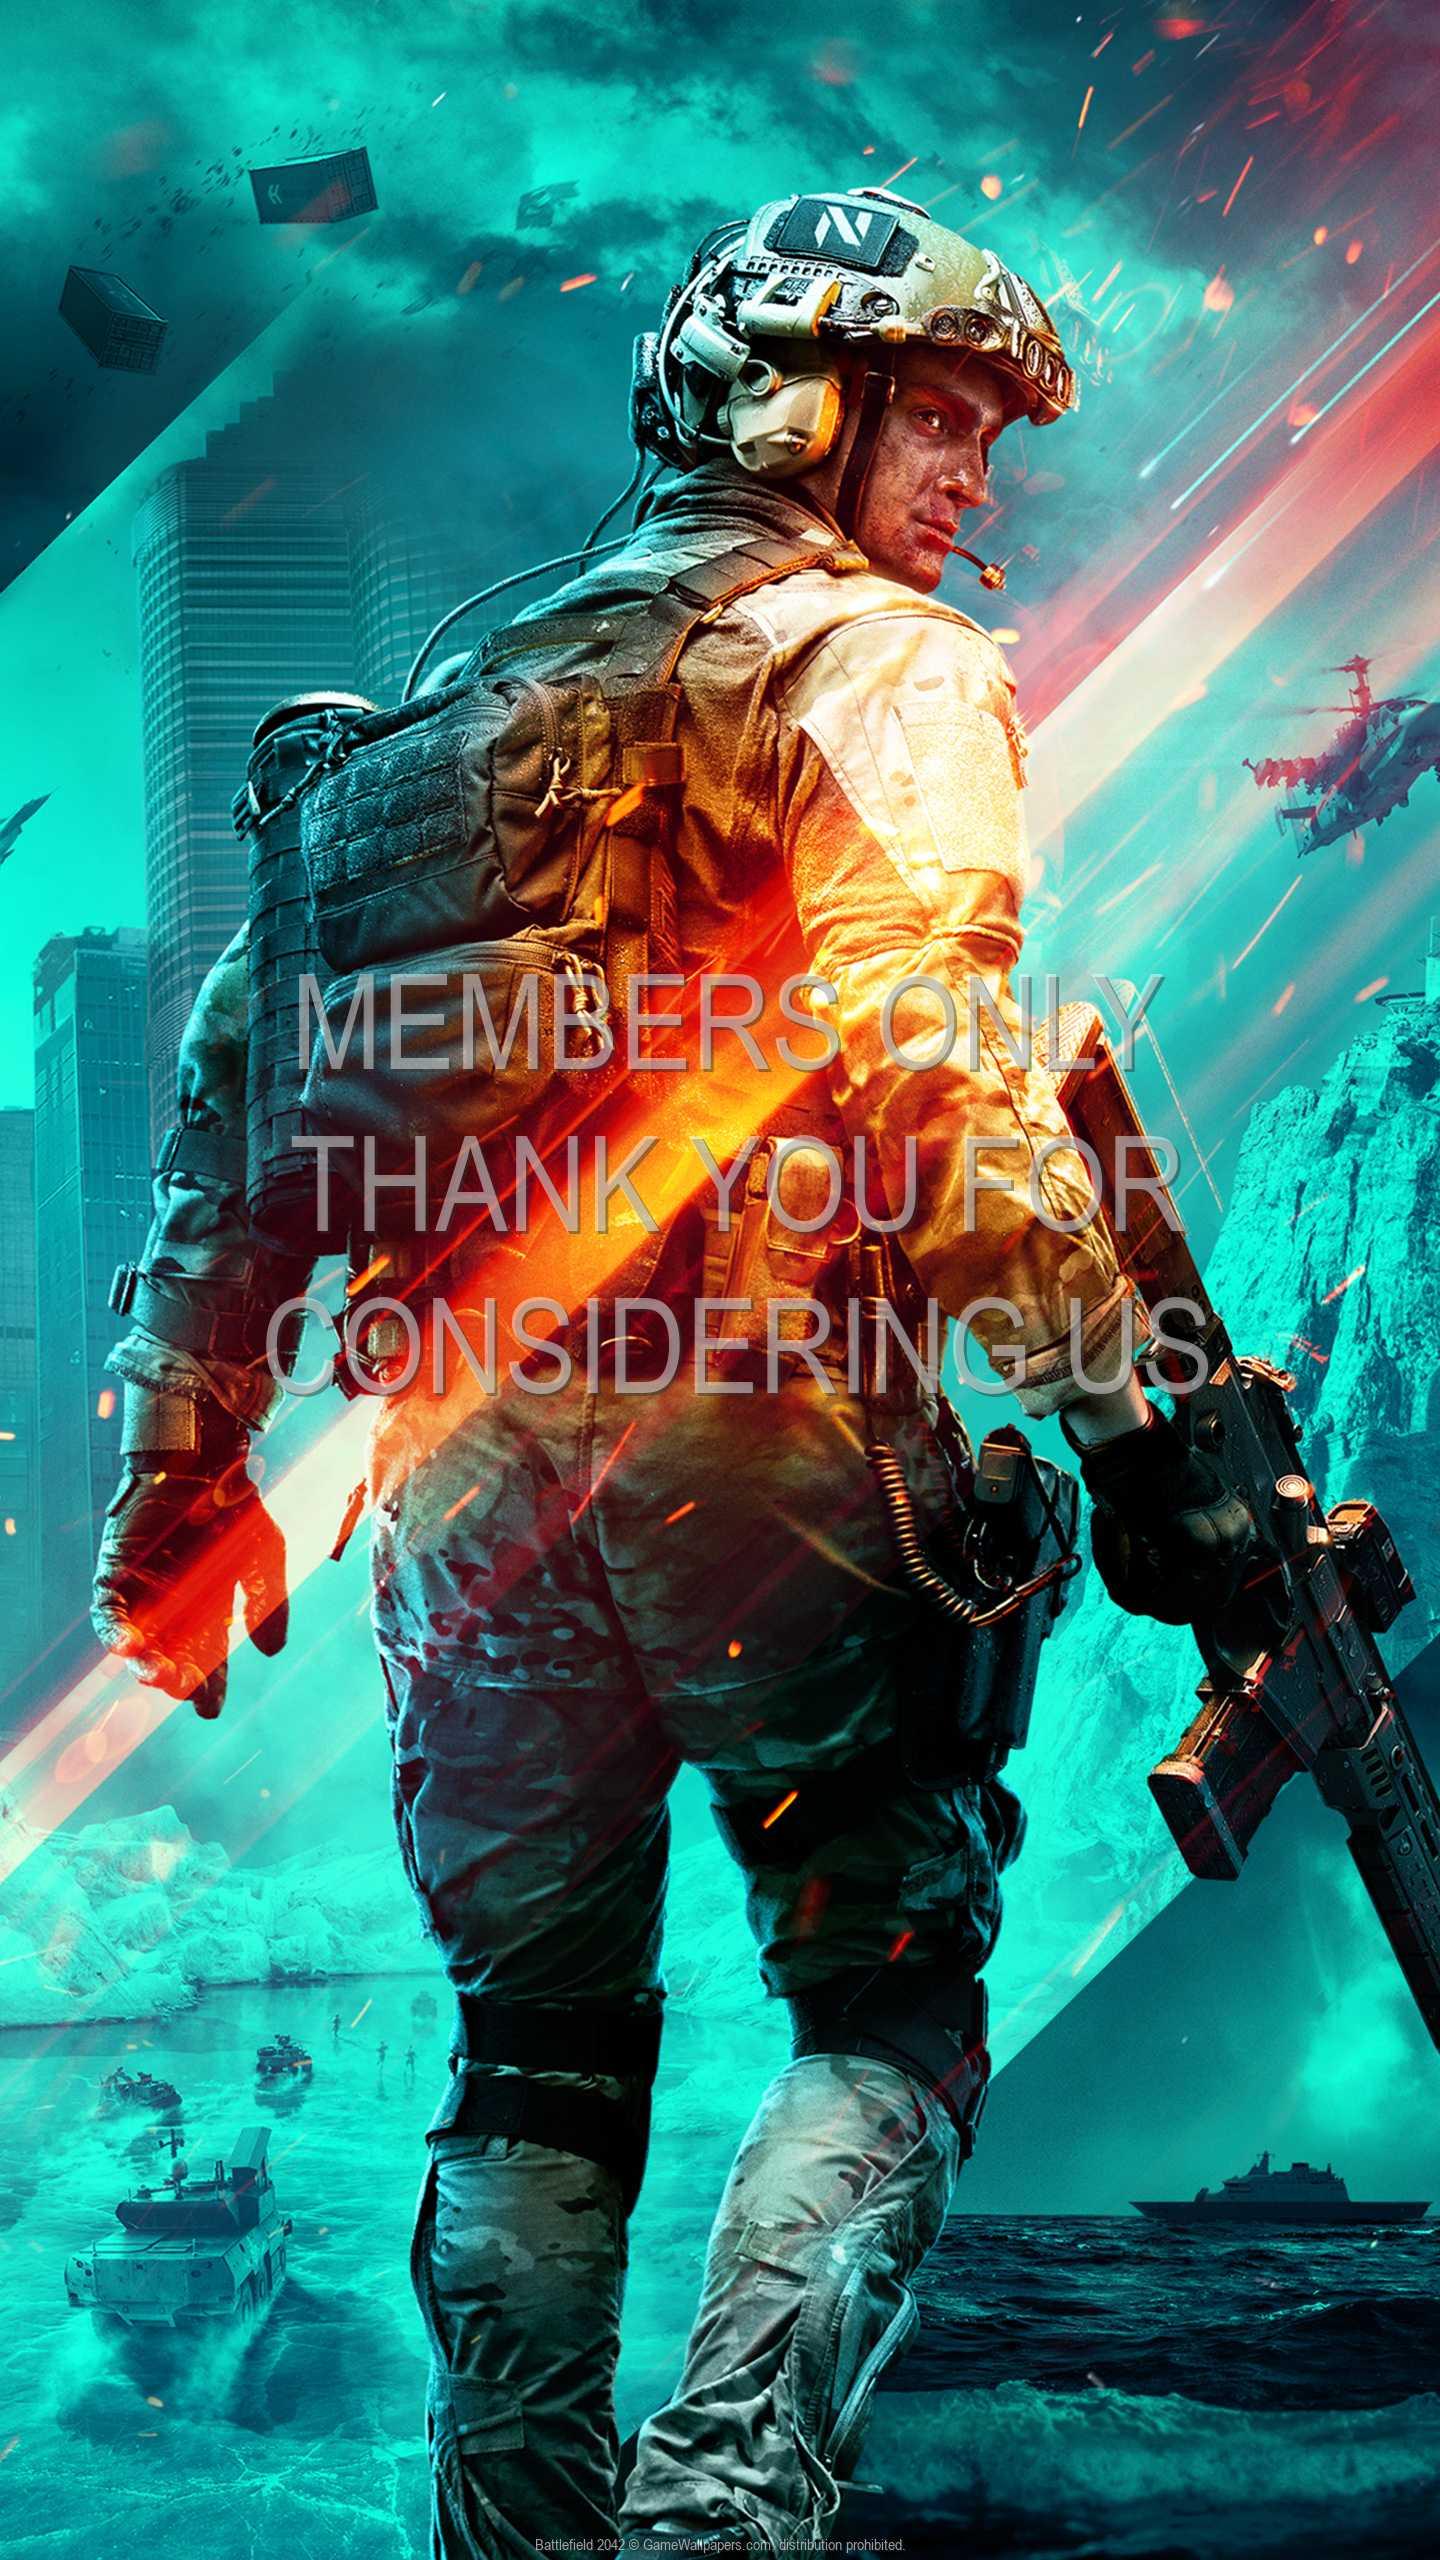 Battlefield 2042 1440p Vertical Mobile wallpaper or background 02